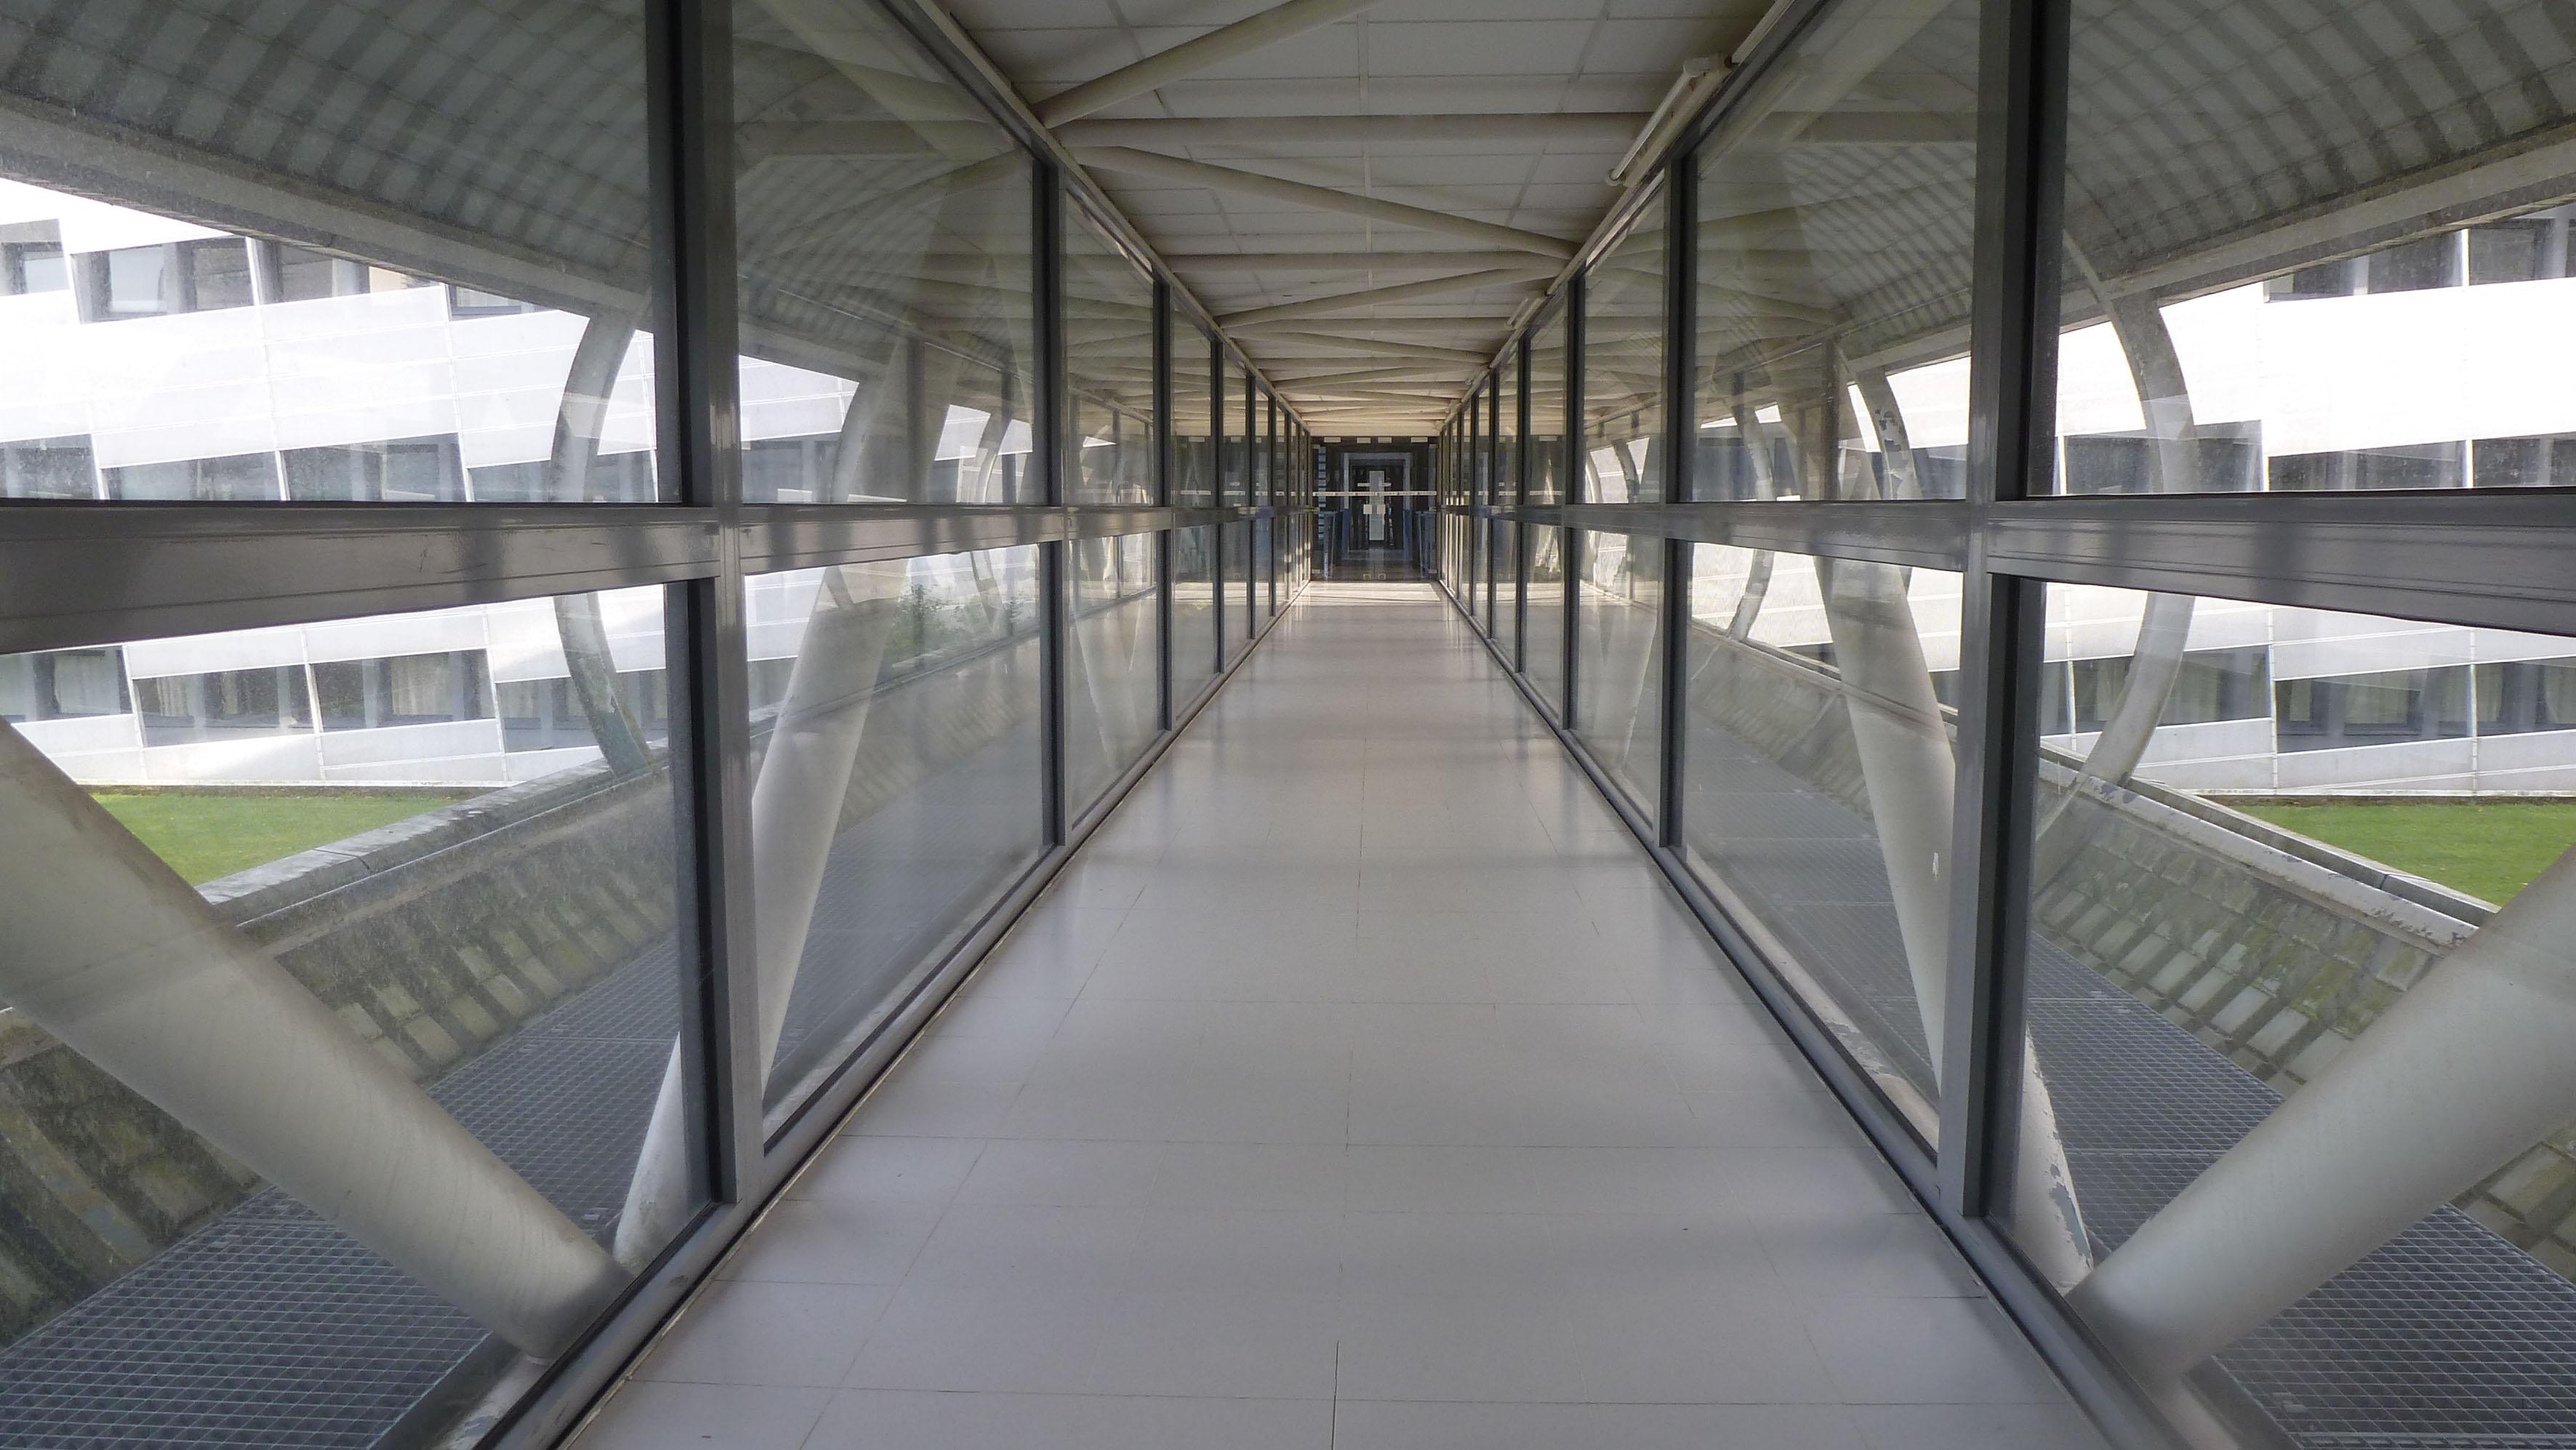 Portes ouvertes ISAE-ENSMA 15 octobre après-midi